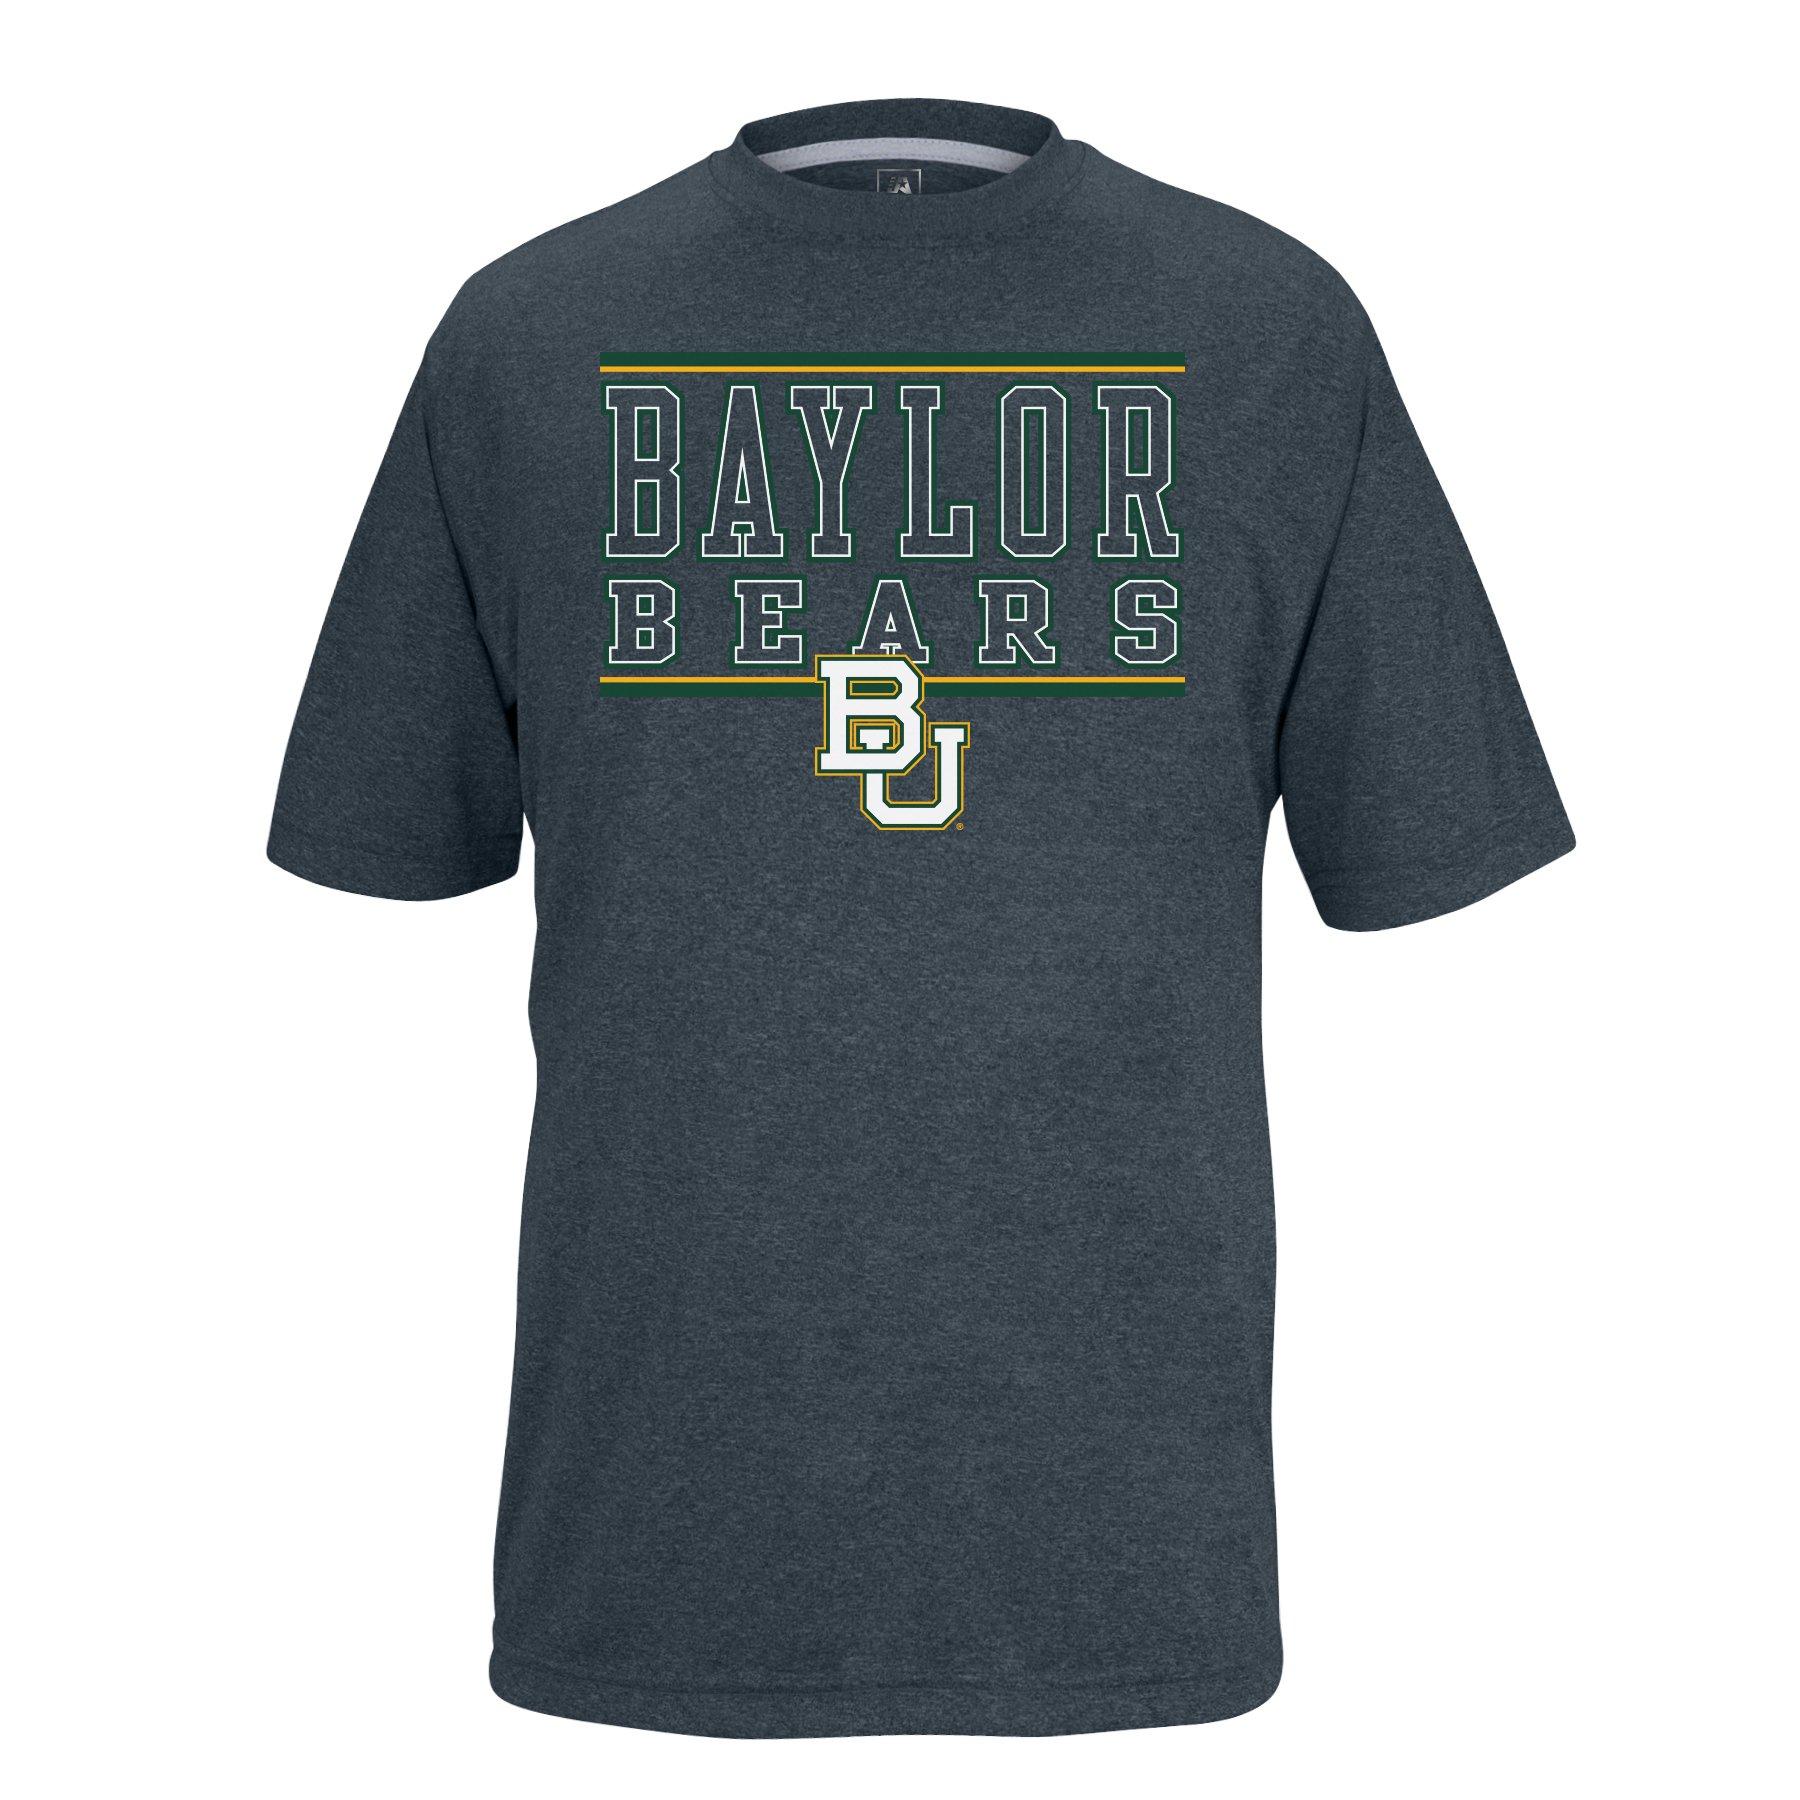 NCAA Baylor Bears Boys Youth Bar Design Vital Poly Tee, Charcoal Heather, Large by J America (Image #1)